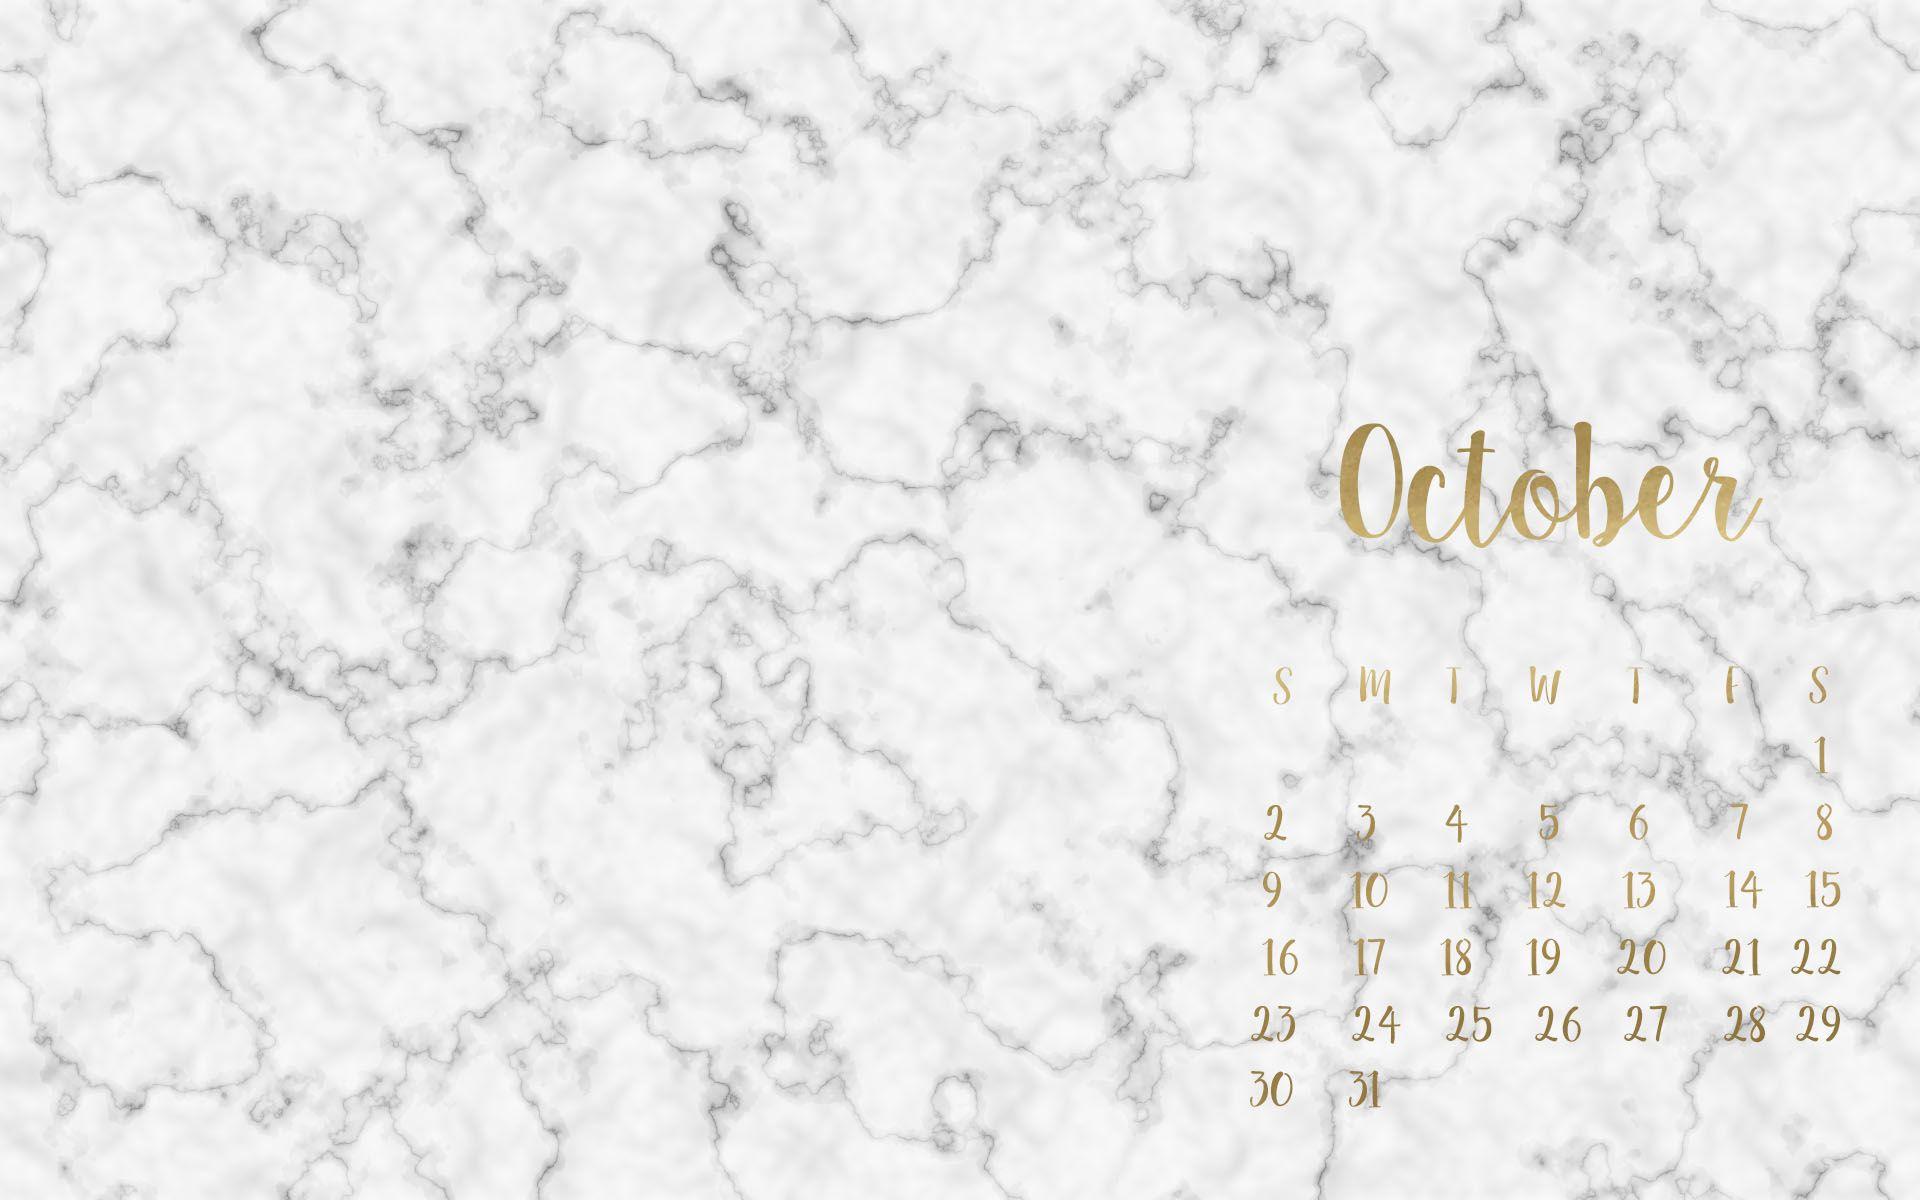 Calendar On Wallpaper Mac : Free october desktop wallpapers wallpaper and mac